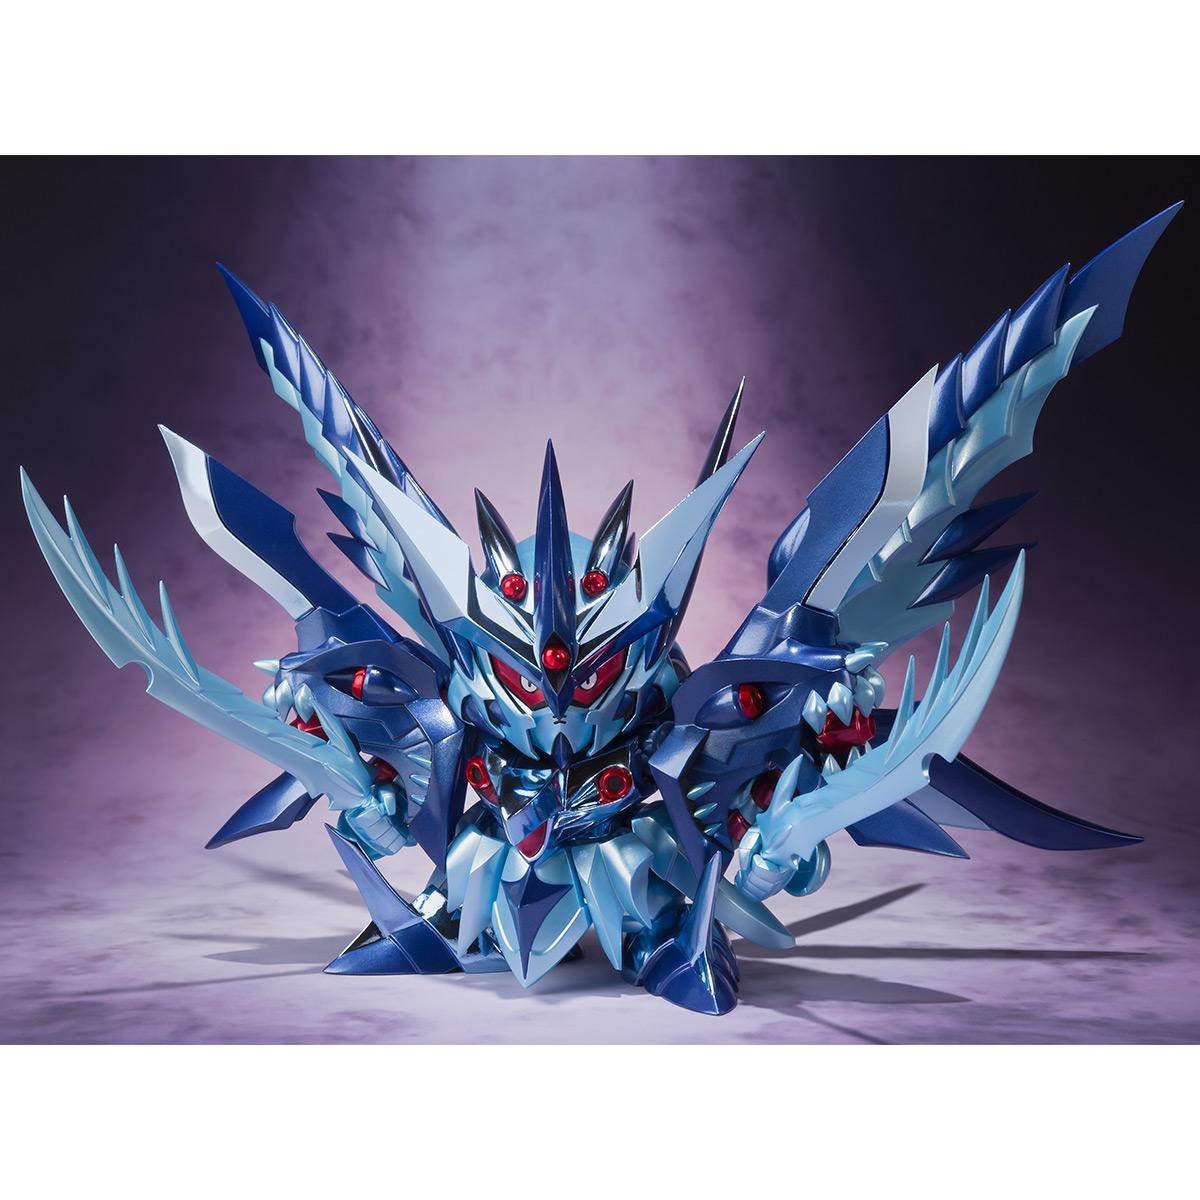 img_sdx_superior_dragon_dark_05_gec.jpg